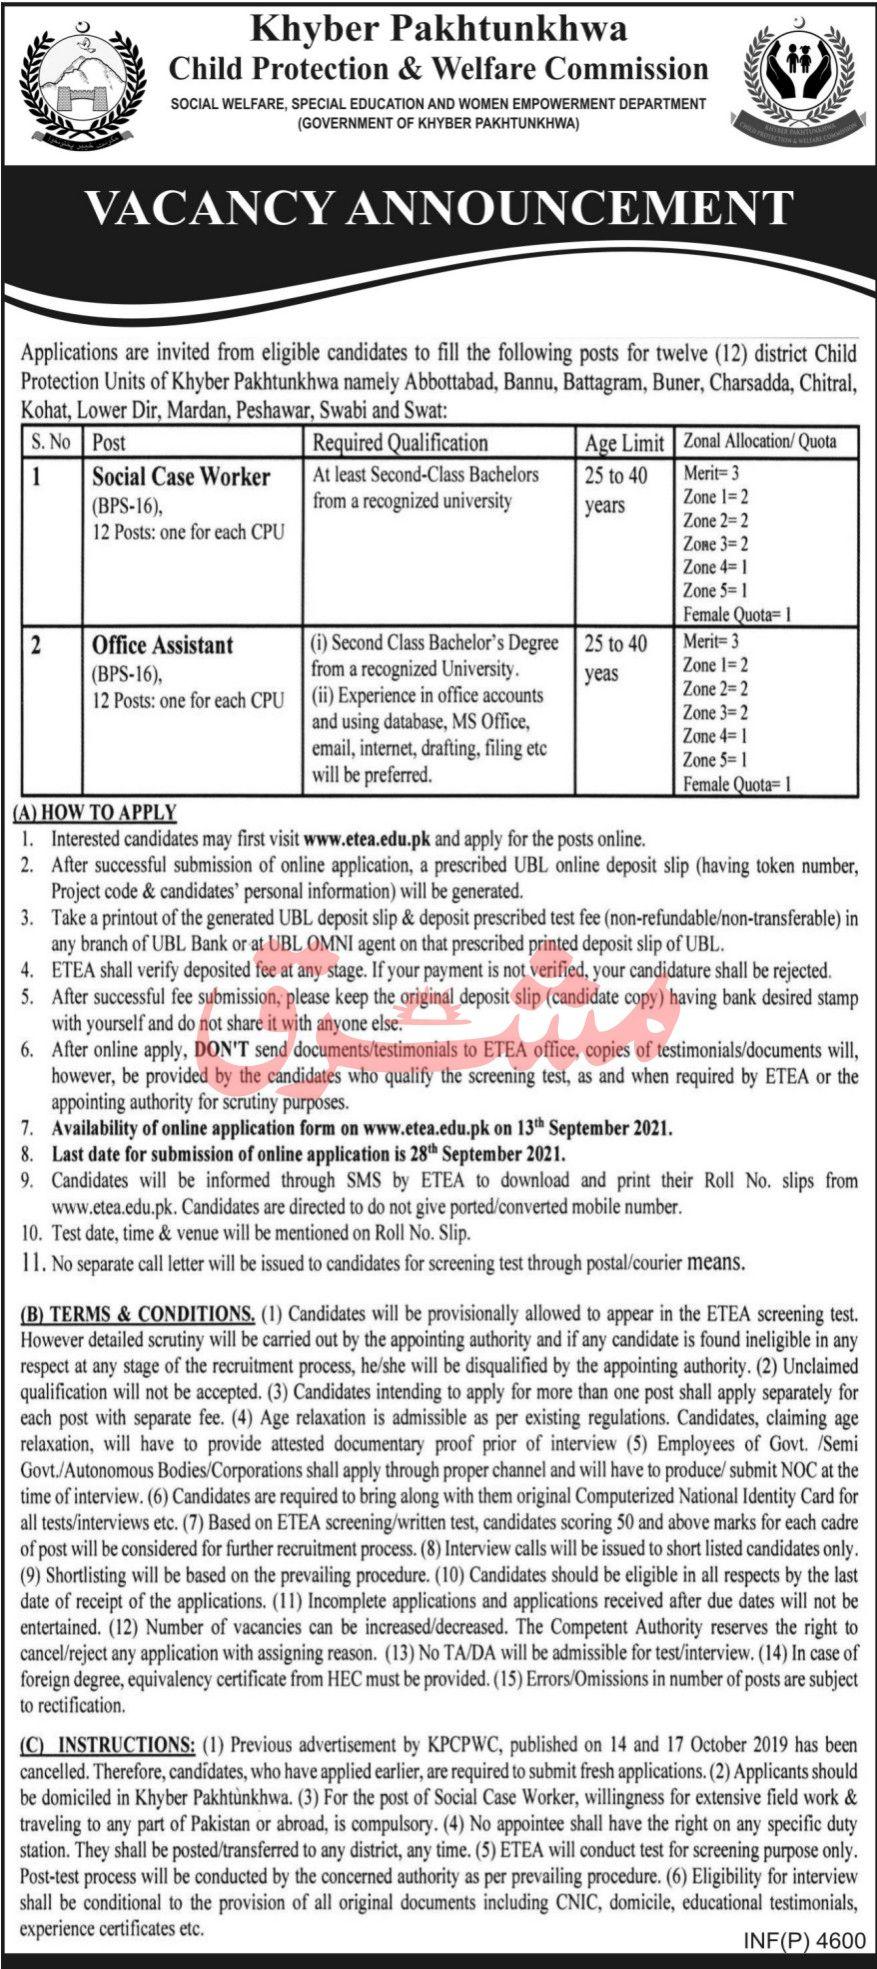 Khyber Pakhtunkhwa Child Protection & Welfare Commission Vacancies 2021 3